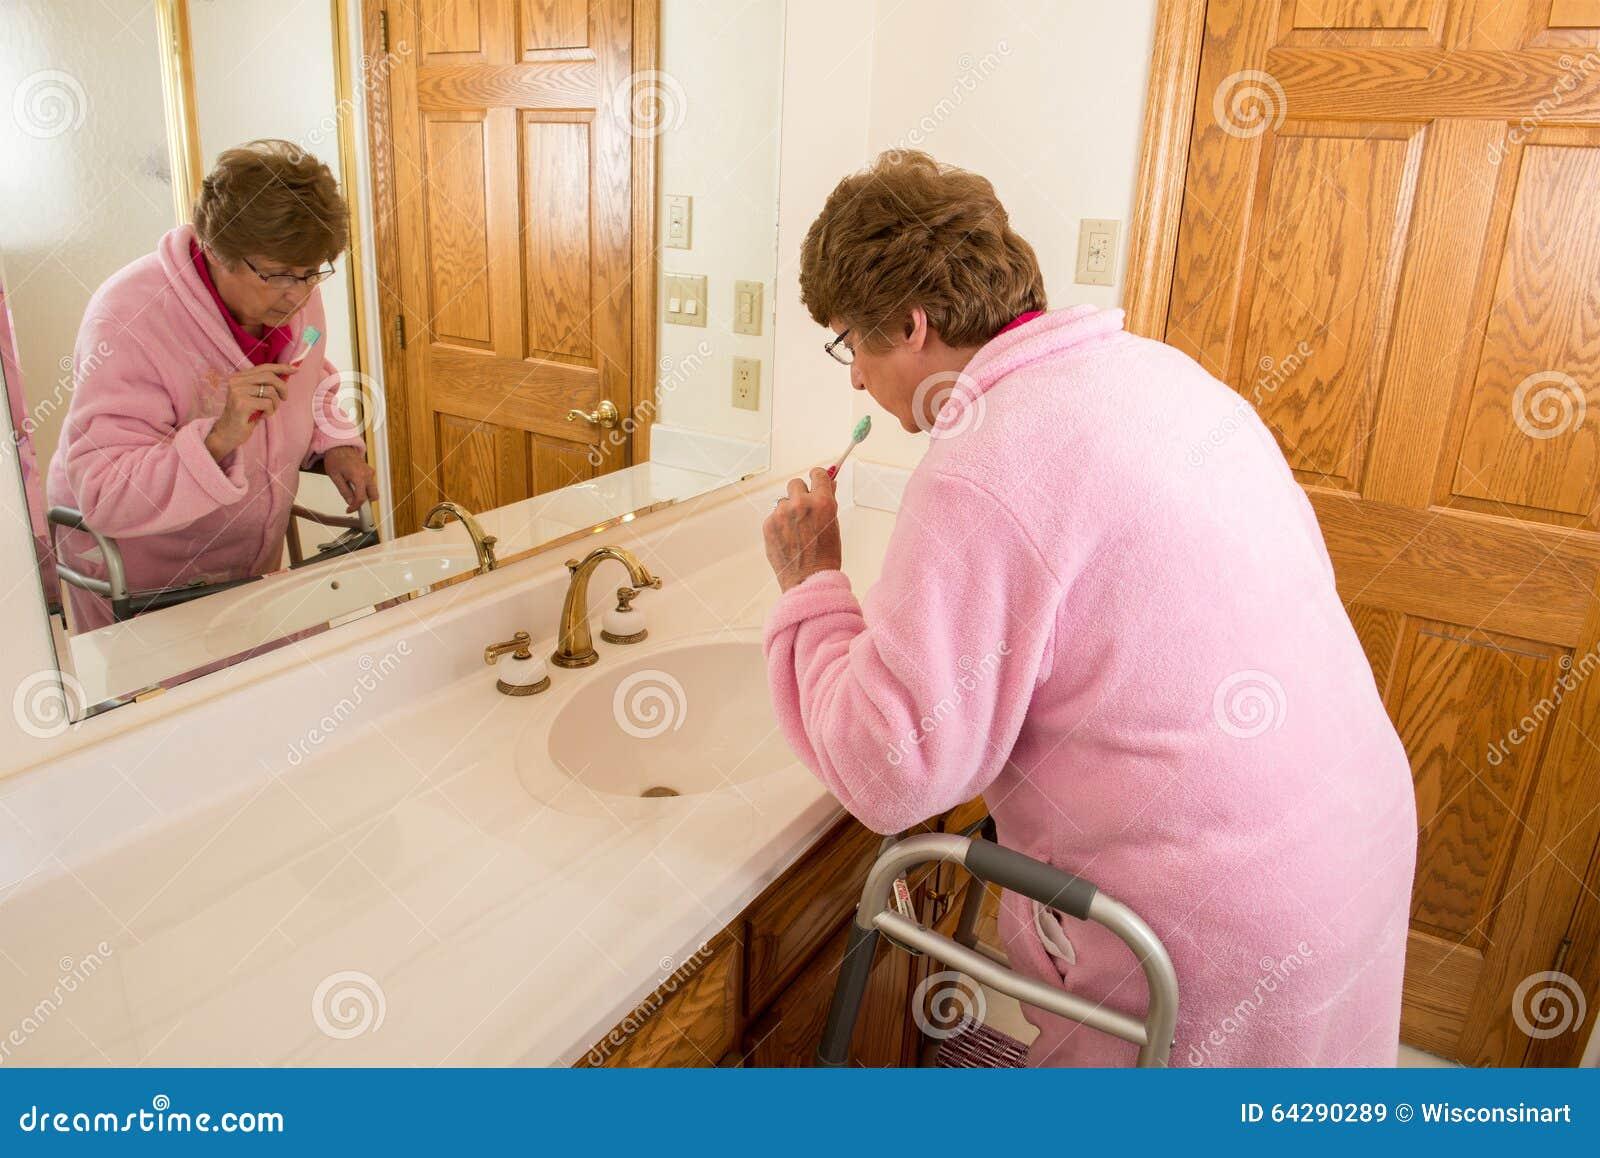 Elderly Senior Woman Brushing Teeth